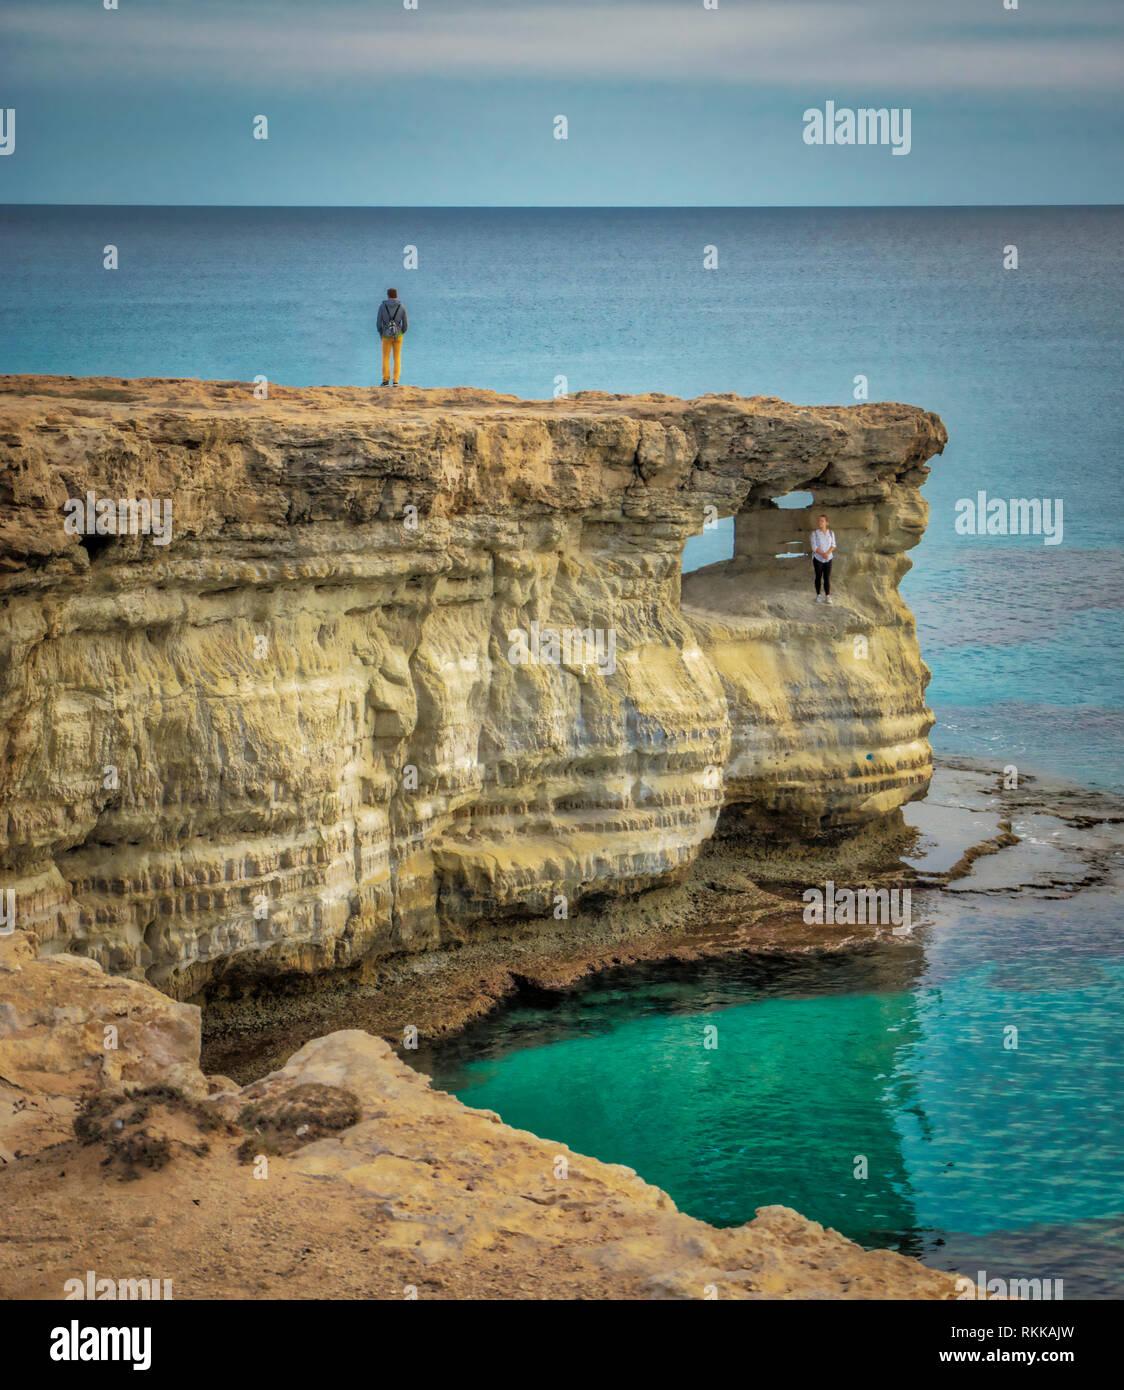 Hide and seek. Cyprus - Ayia napa sea caves Stock Photo